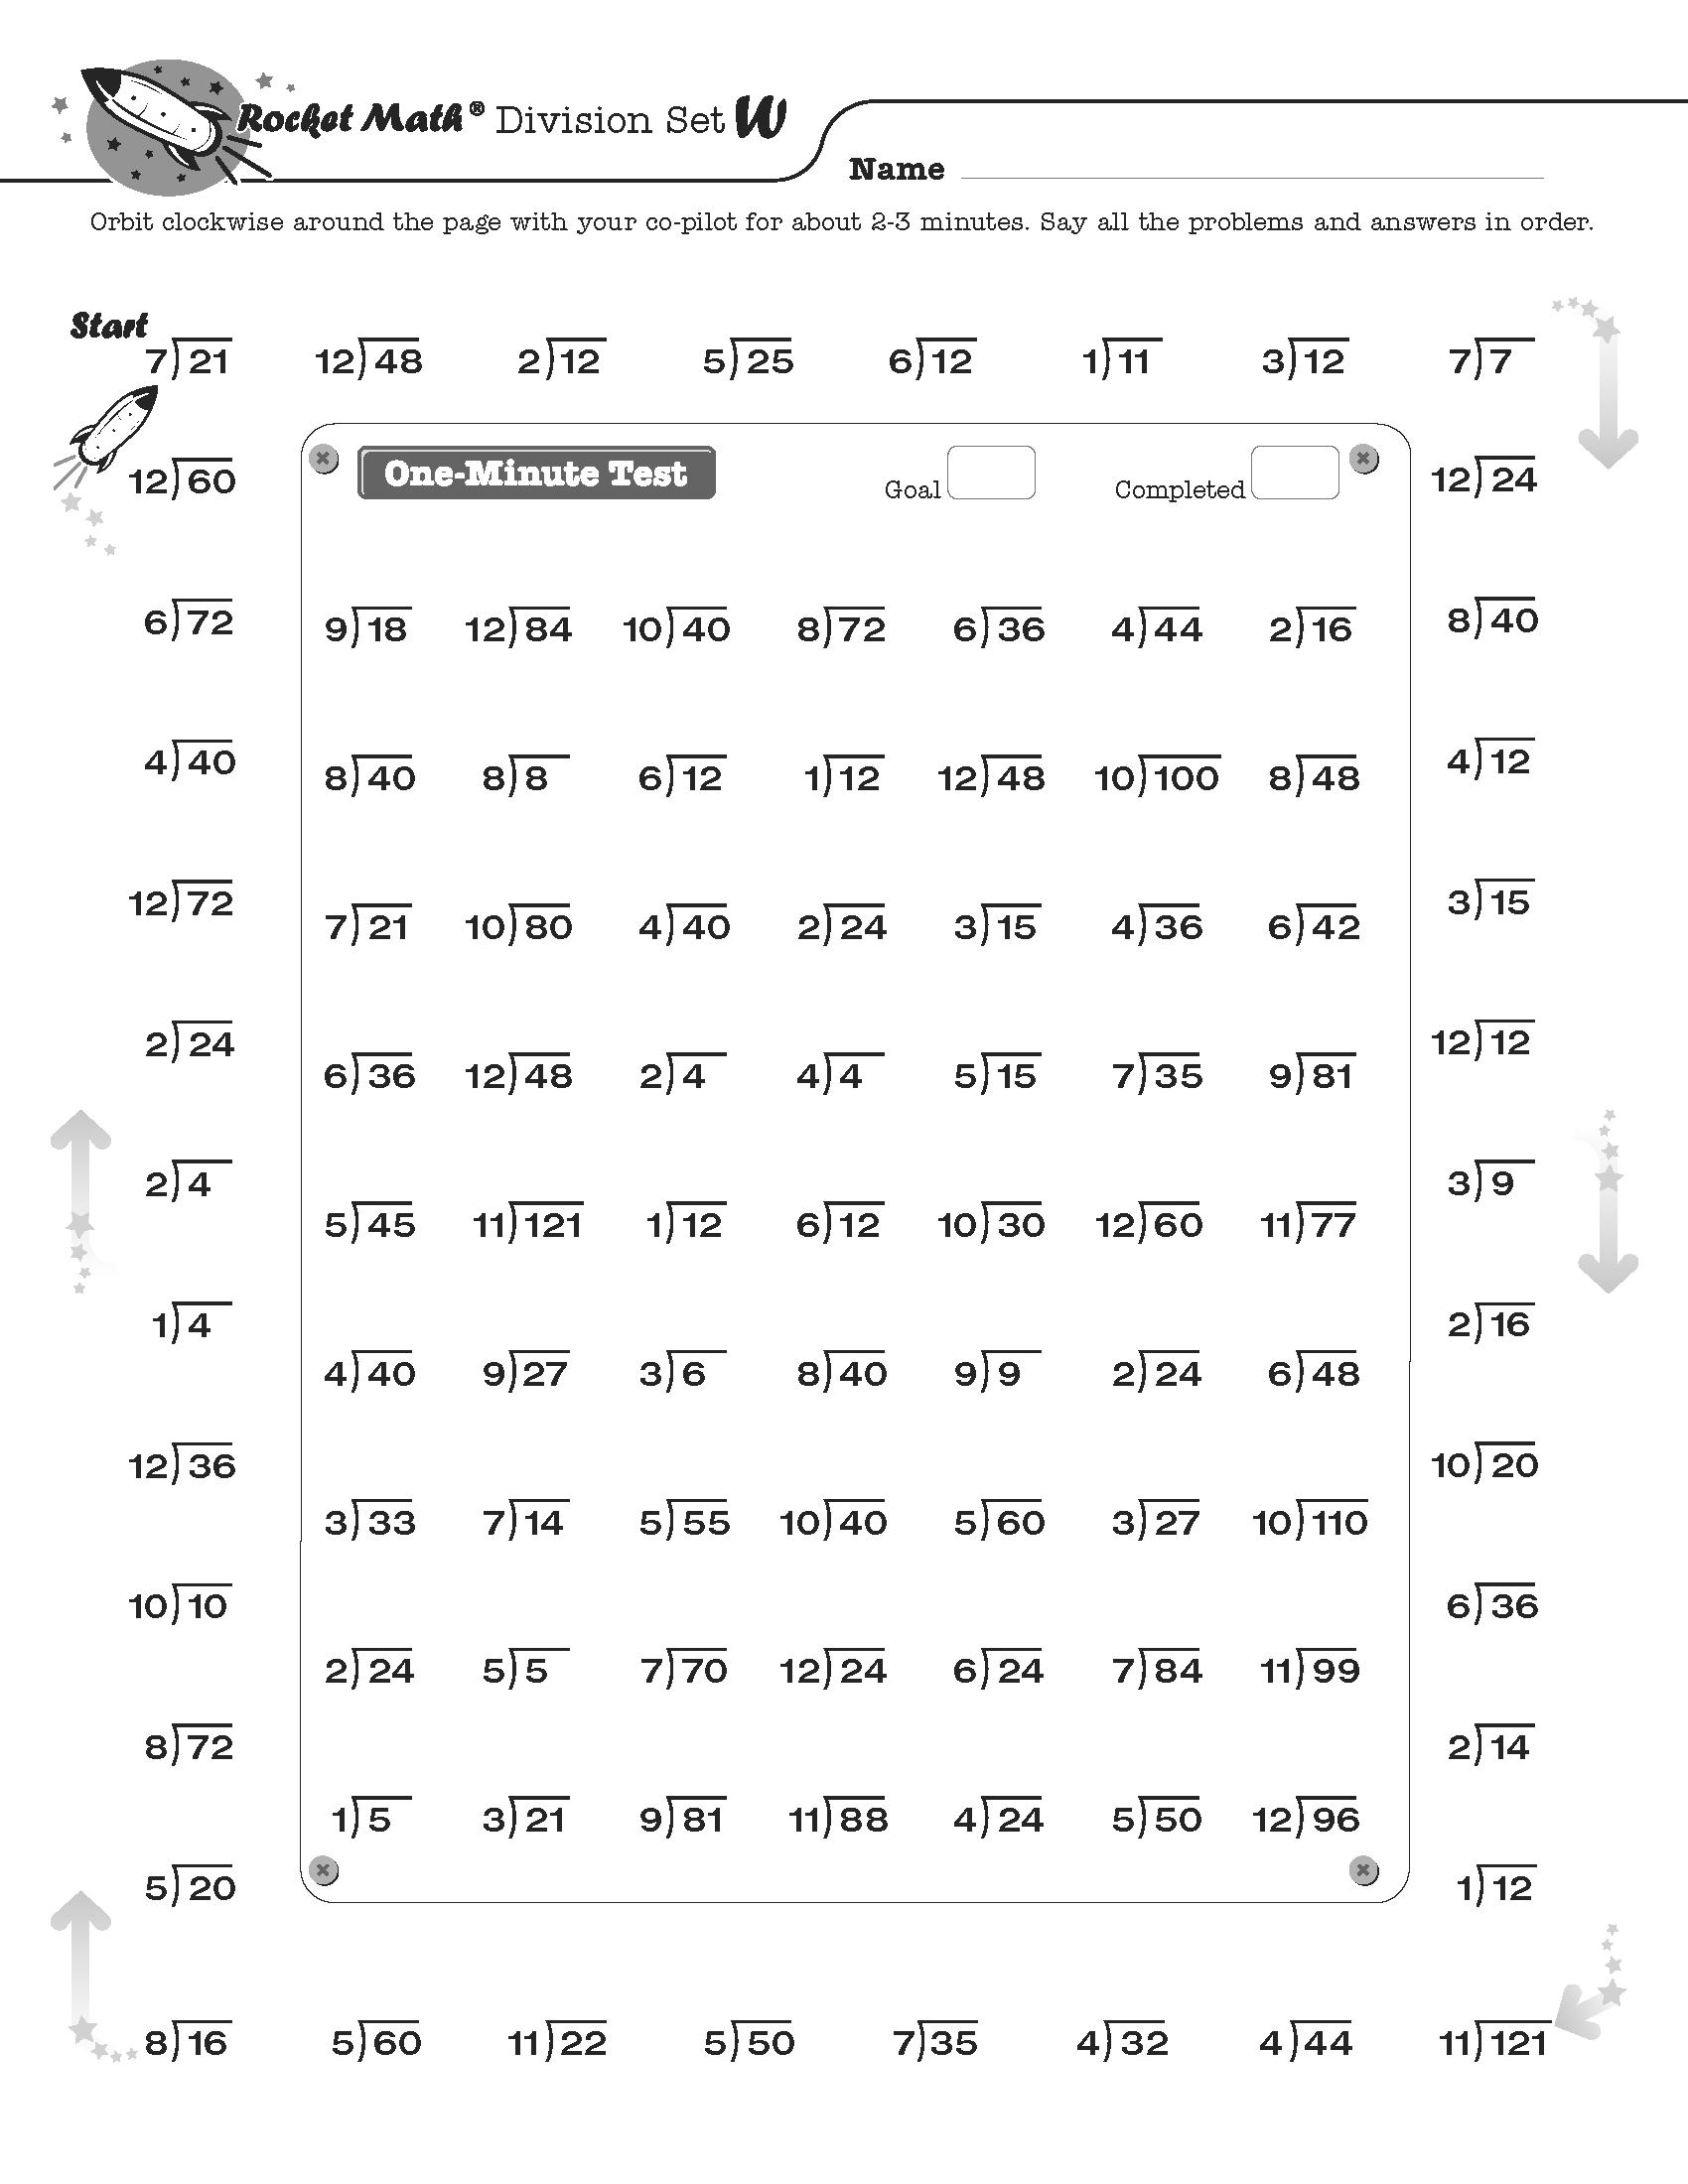 Knepp, Katrina / Rocket Math